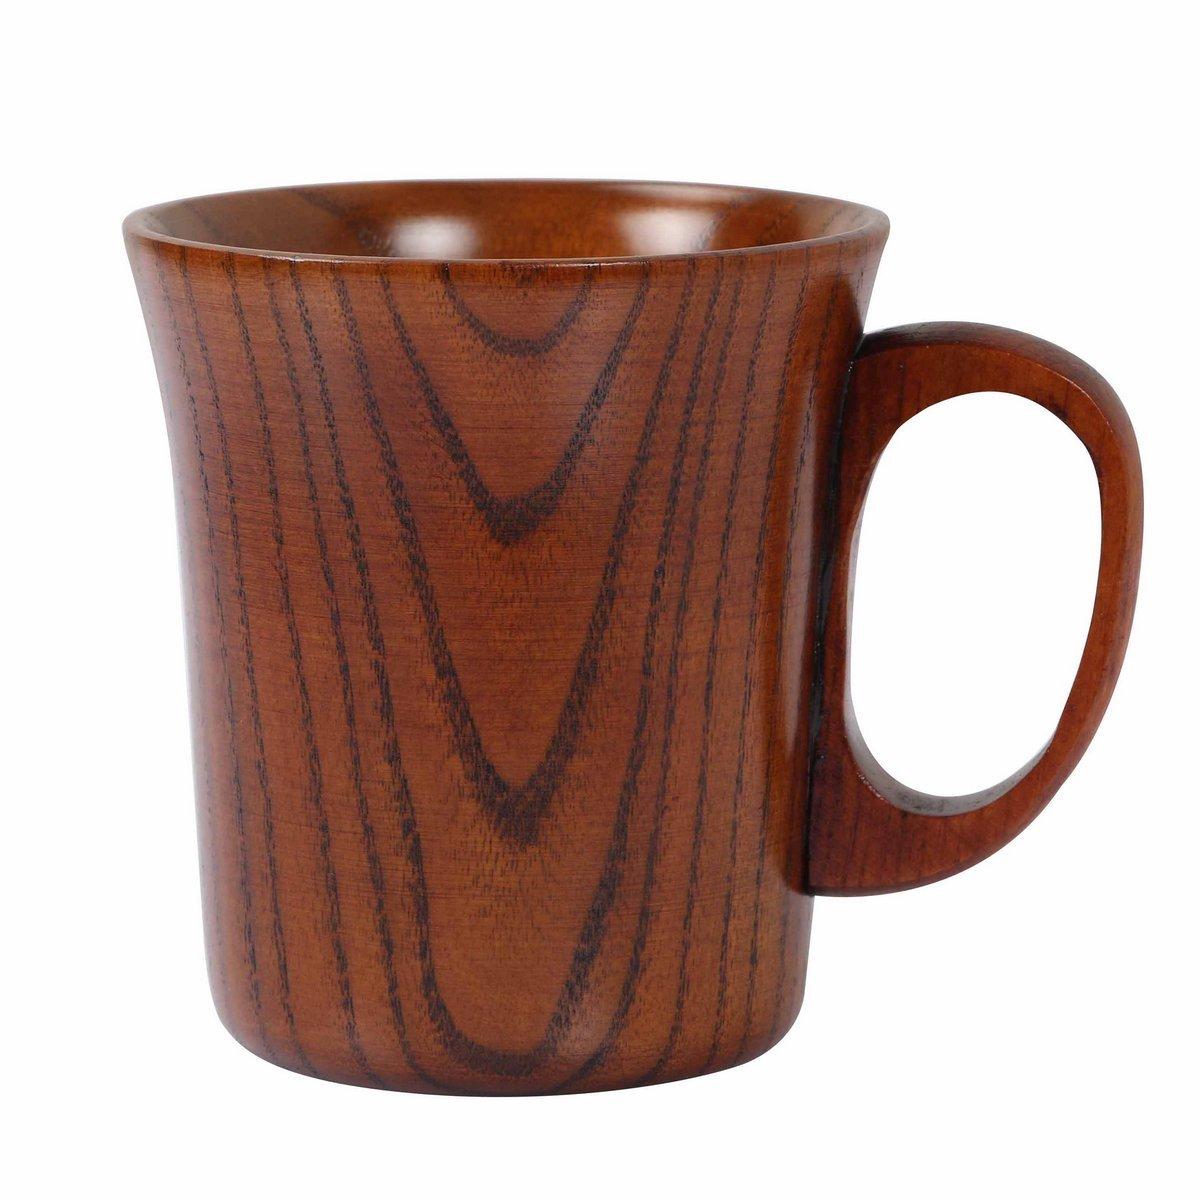 Geeklife Jujube Wood Coffee Mug Wooden Tea Cup, Brown (300ml)